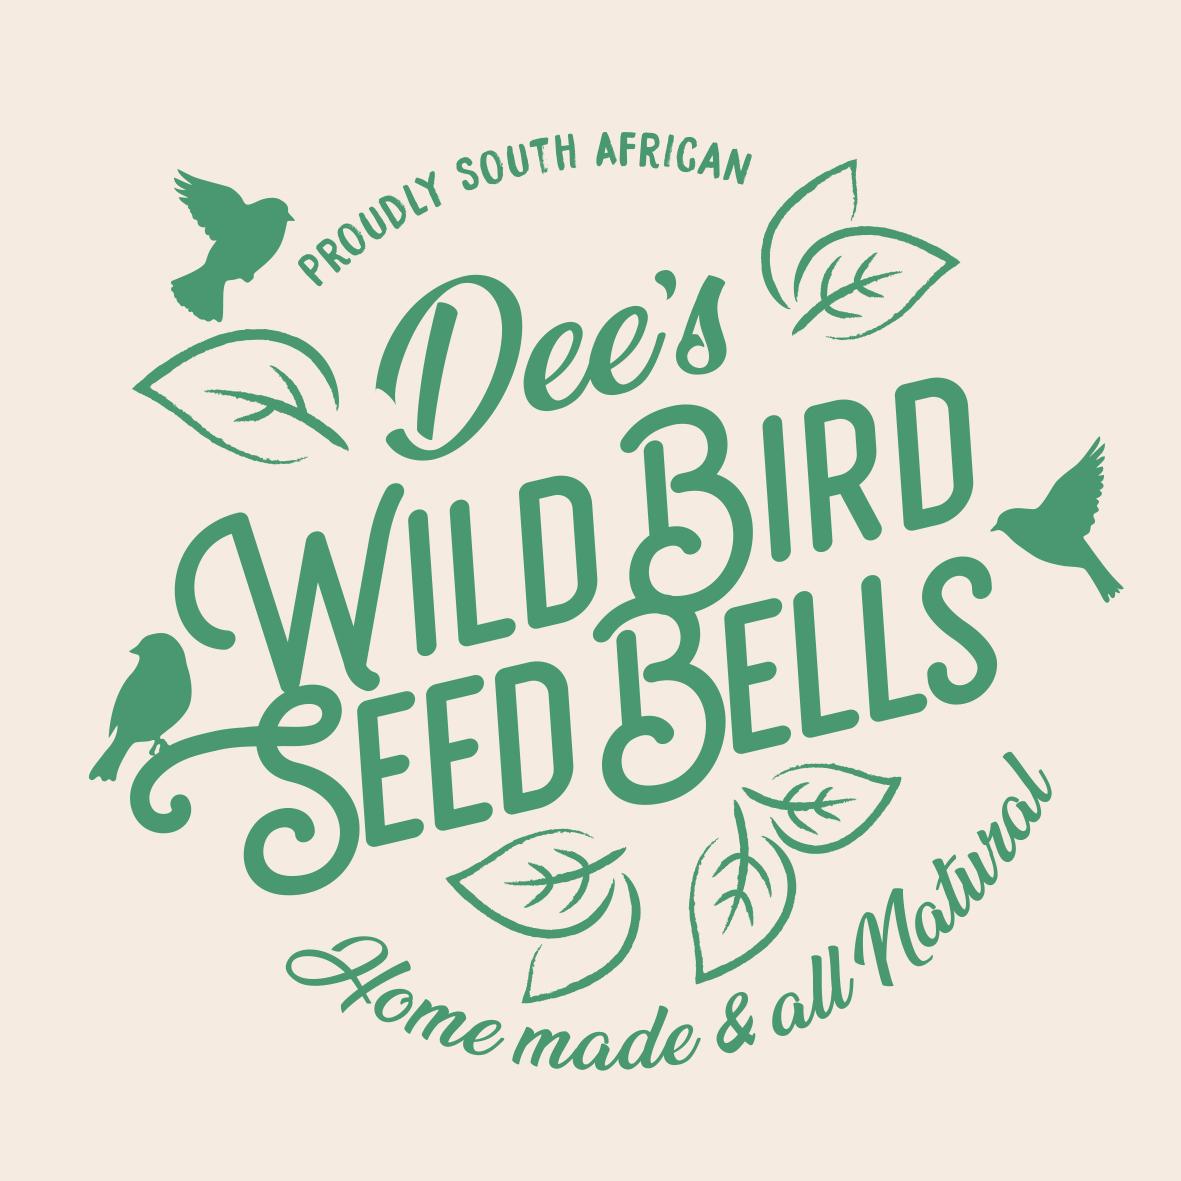 Dees Wild Bird Seed Bells